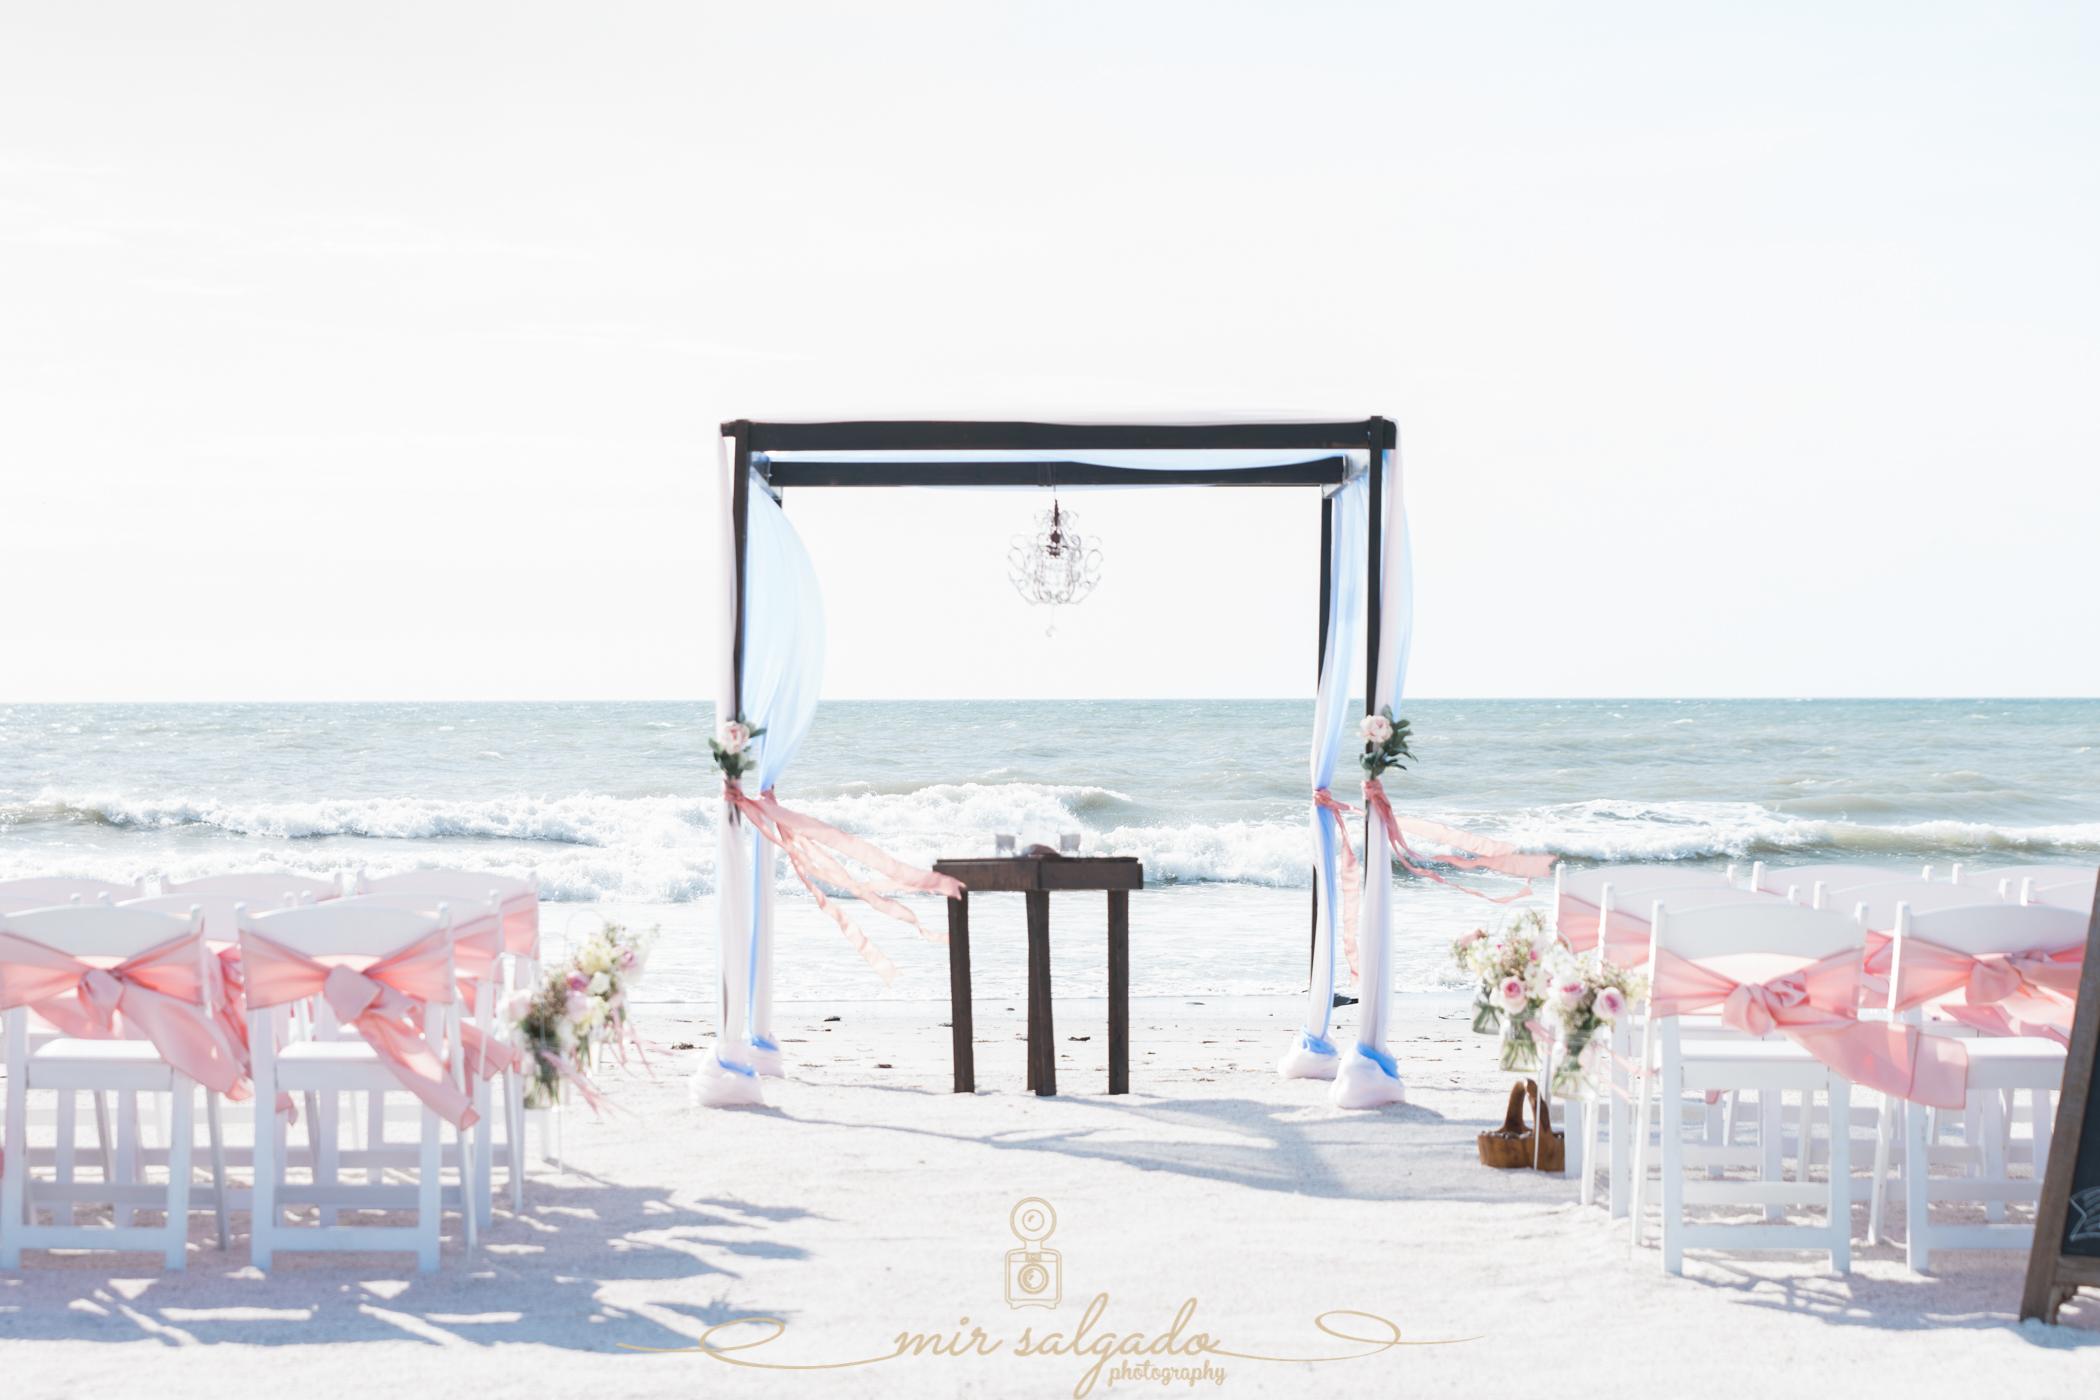 Pass-a-grille-beach-wedding, tide-the-knot-beach-weddings-photo